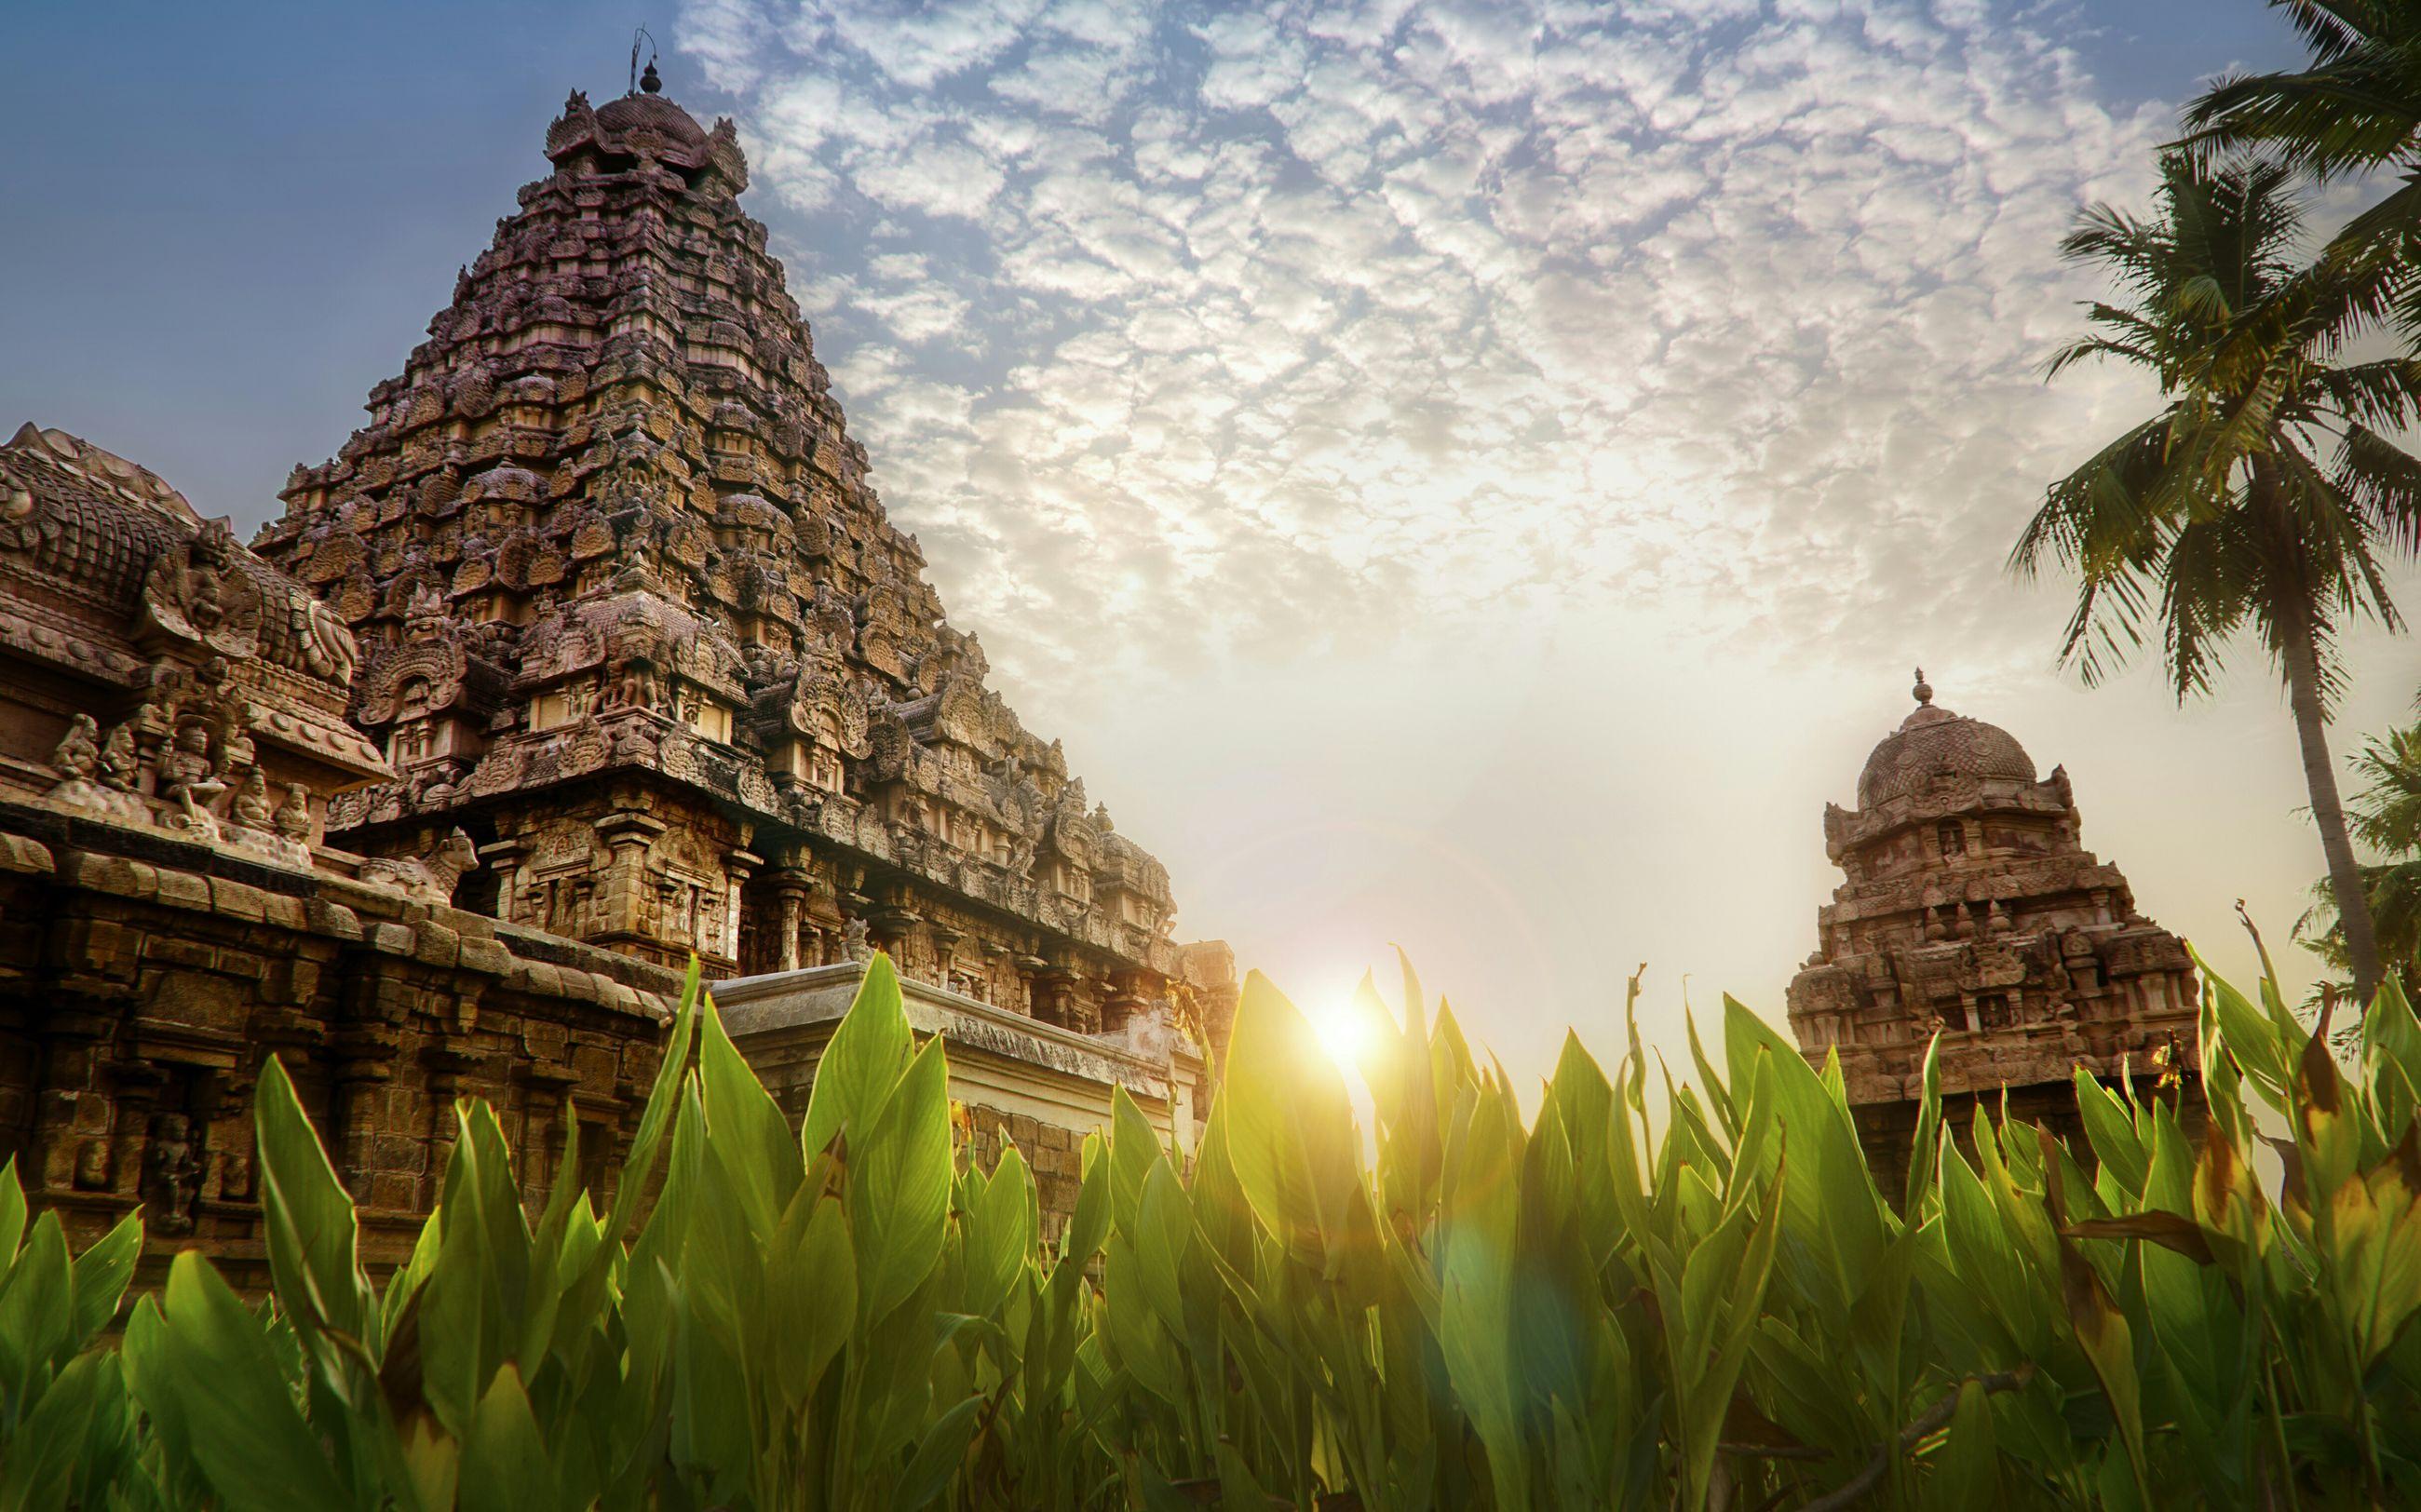 Low angle view of gangaikonda cholapuram temple against cloudy sky